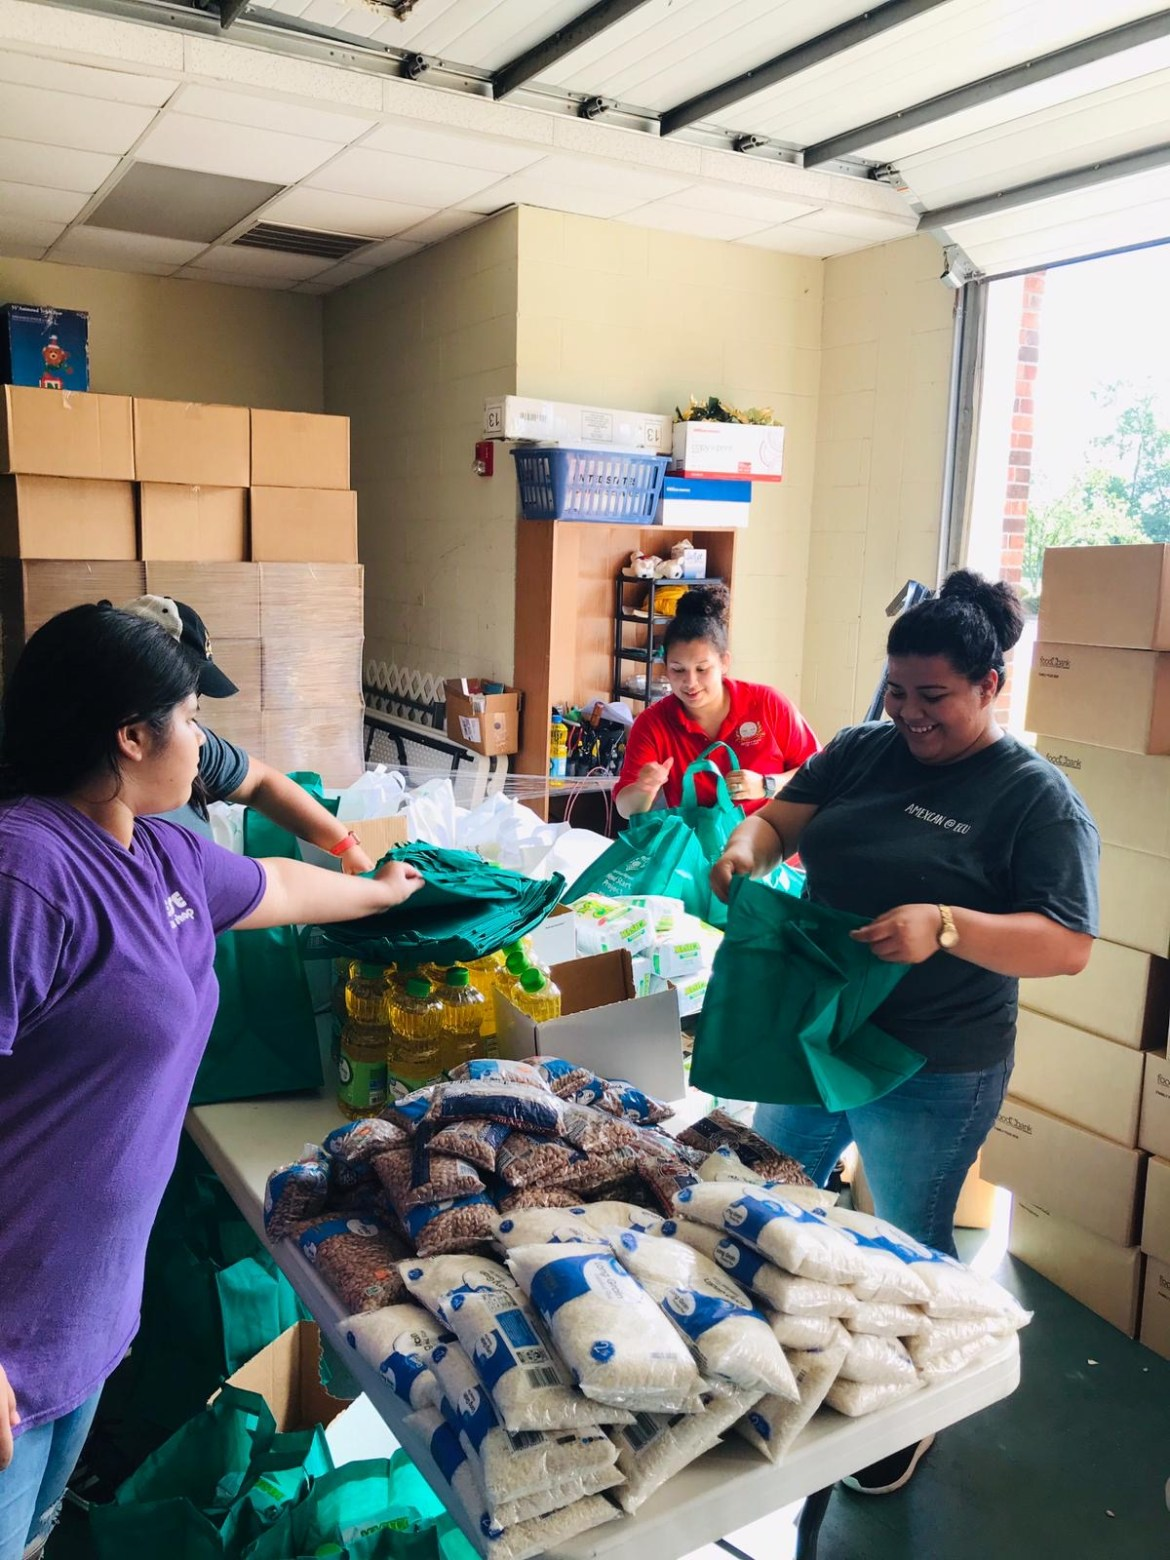 AMEXCAN distribucion de alimentos a familias vulnerables